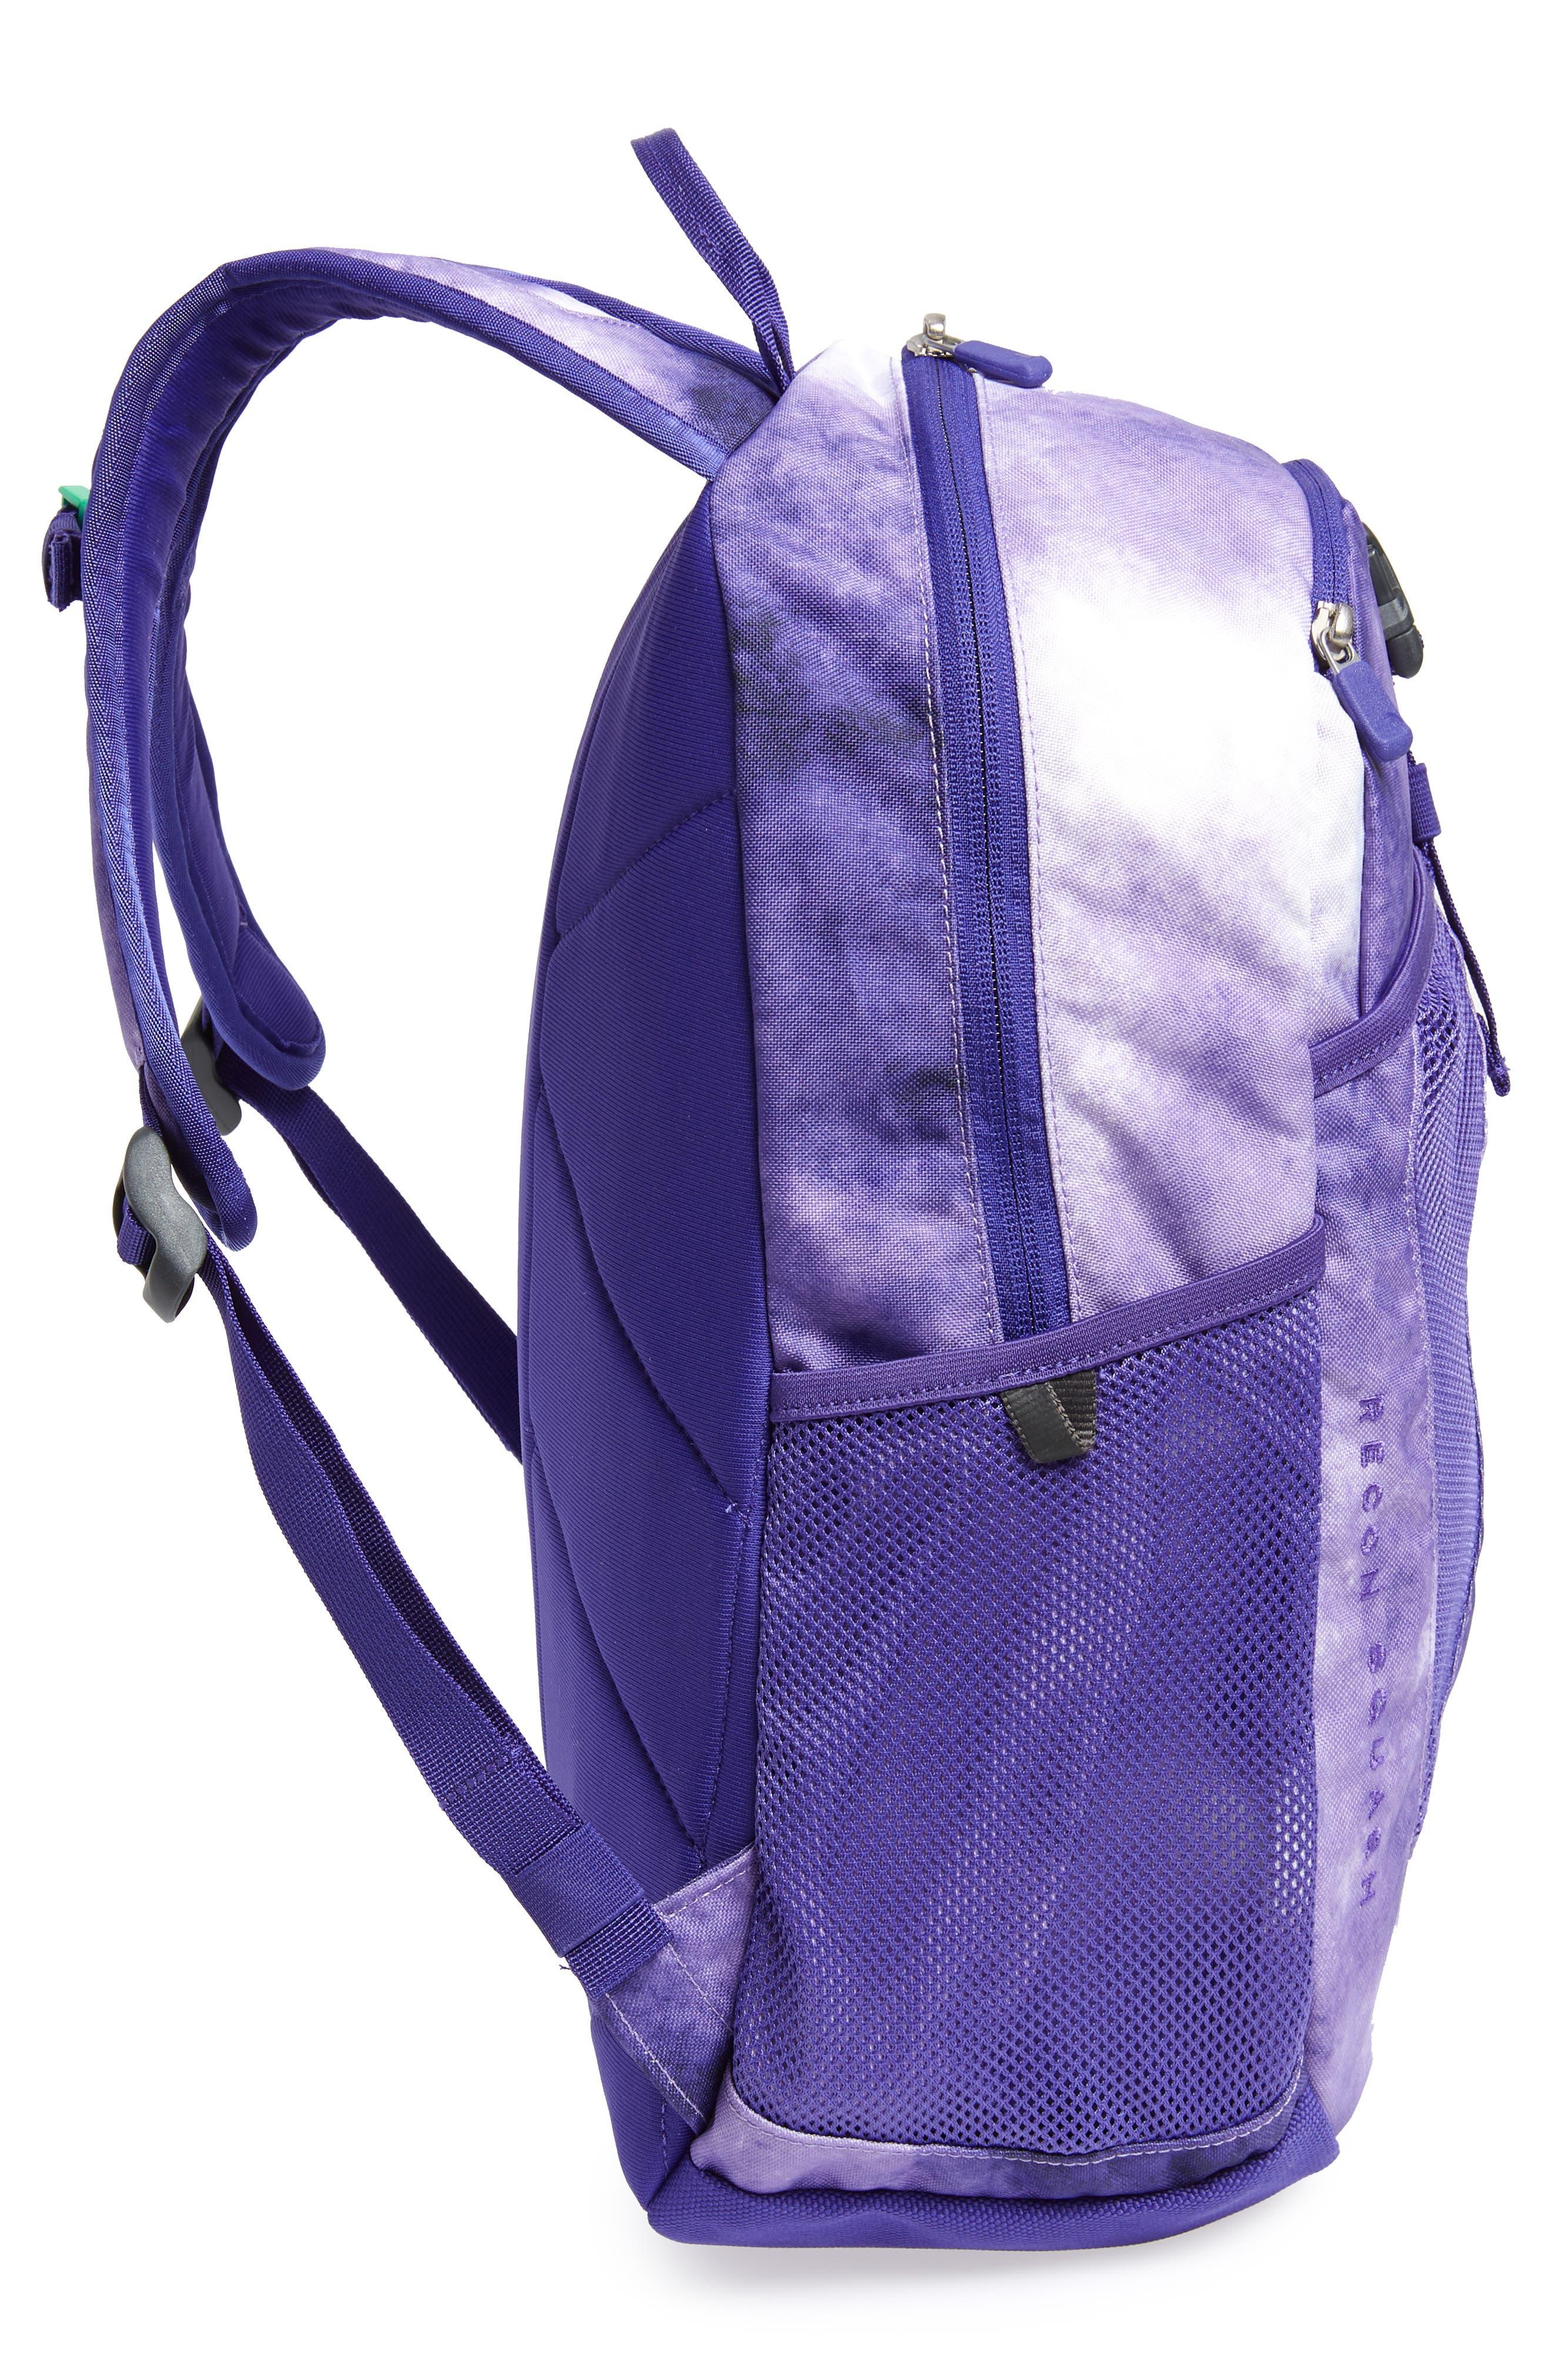 Recon Squash Backpack,                             Alternate thumbnail 4, color,                             501